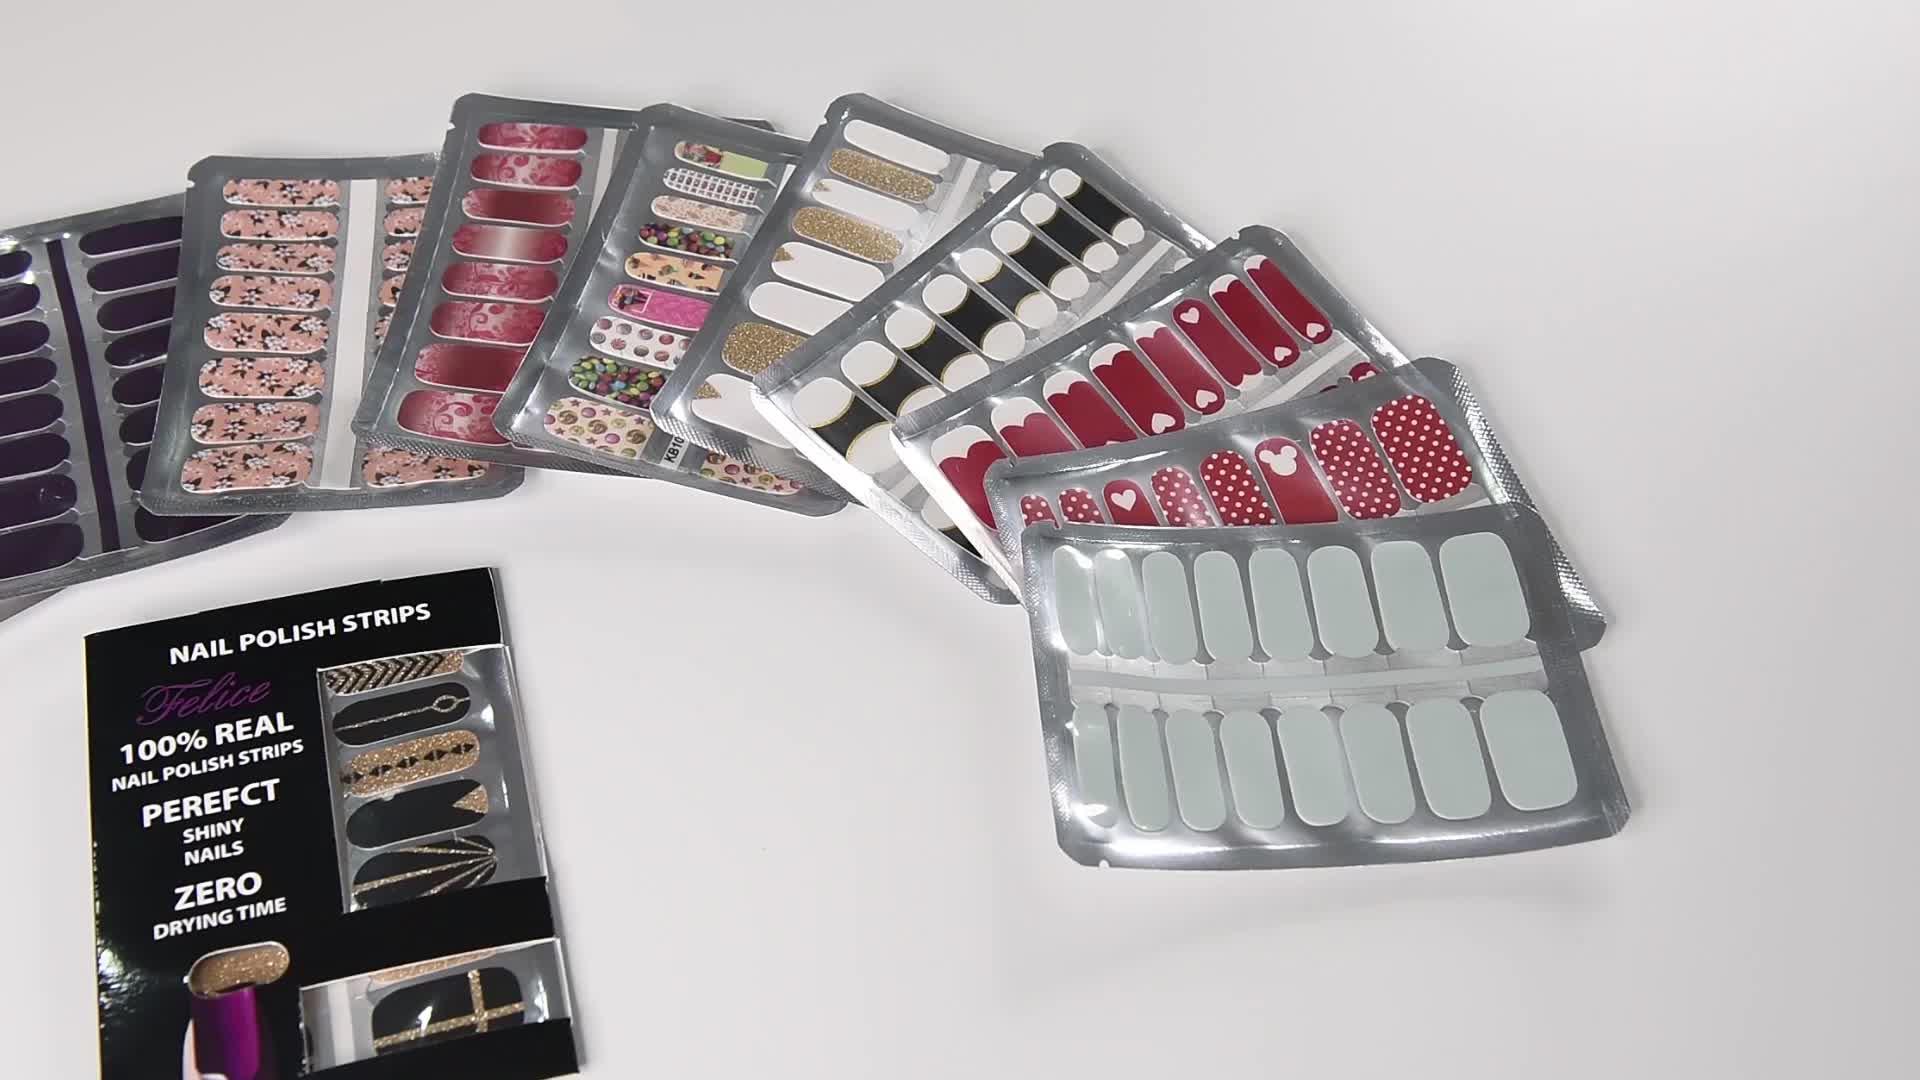 Wholesale Non-toxic Nail Sticker Nail Polish Wraps/Nail Polish Strips /100% Real Nail Sticker